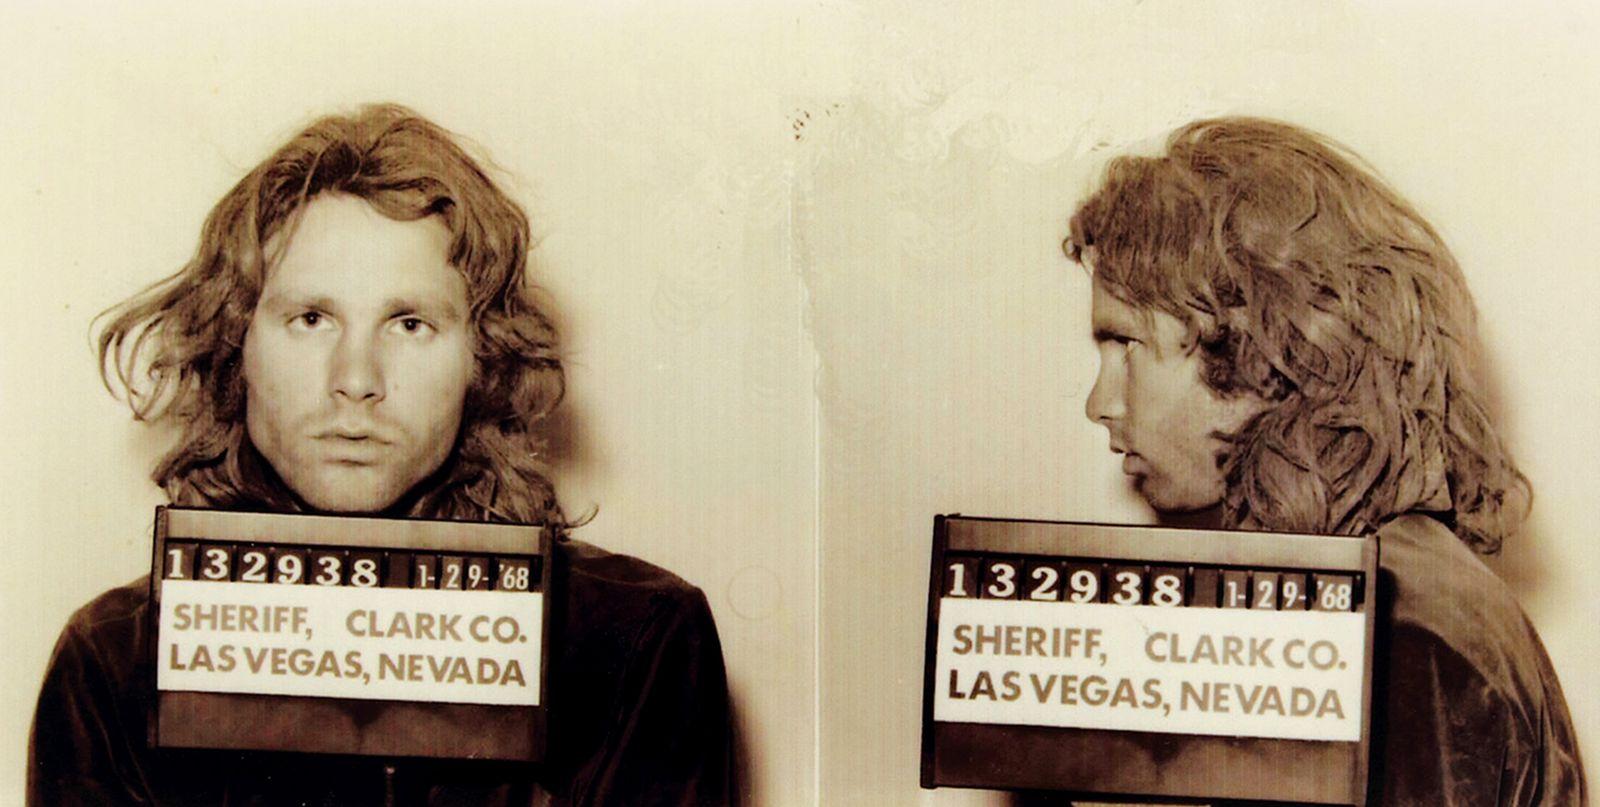 Jim Morrison Mugshot in Las Vegas